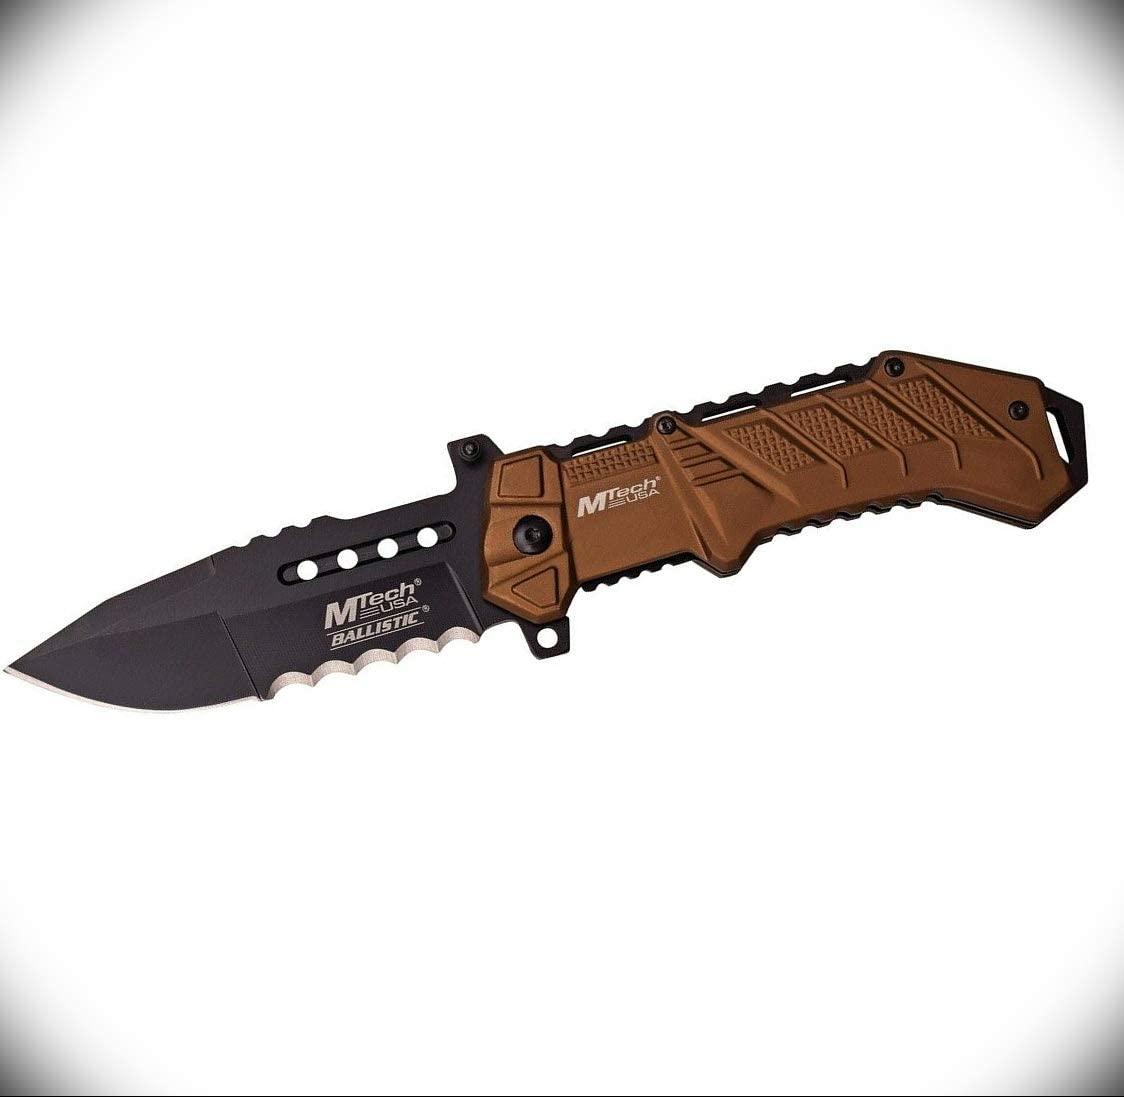 Mtech Linerlock Pocket Knife for Men 3.75